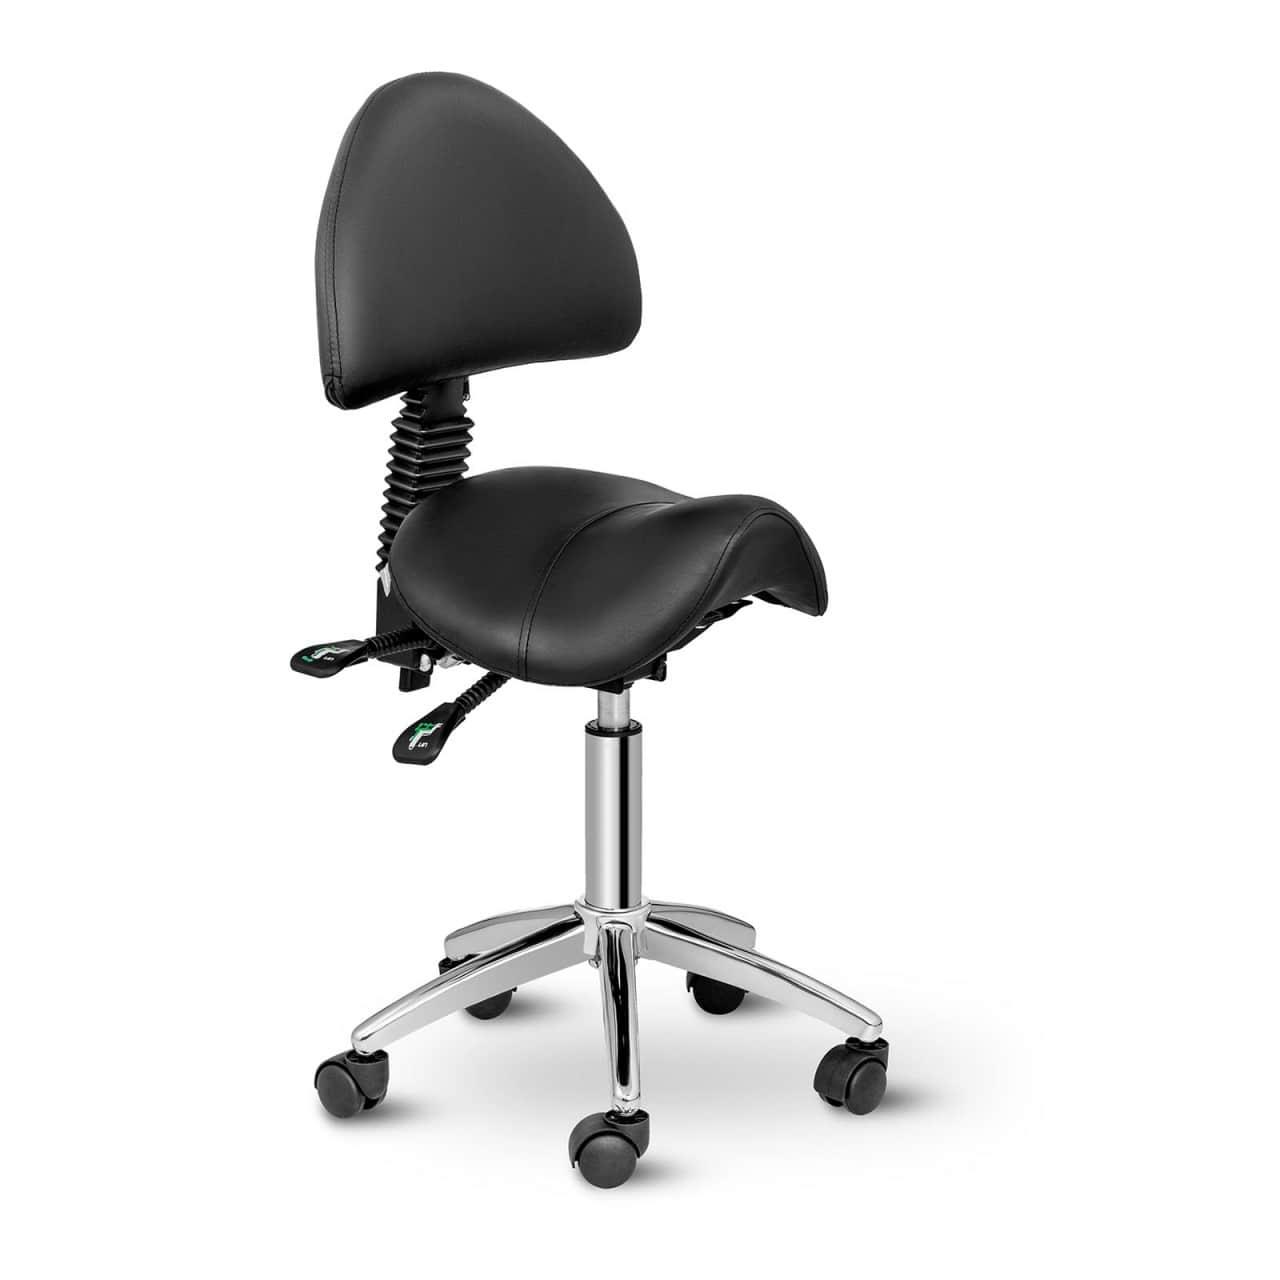 Krzeslo Kosmetyczne Berlin Black Emaks Pl